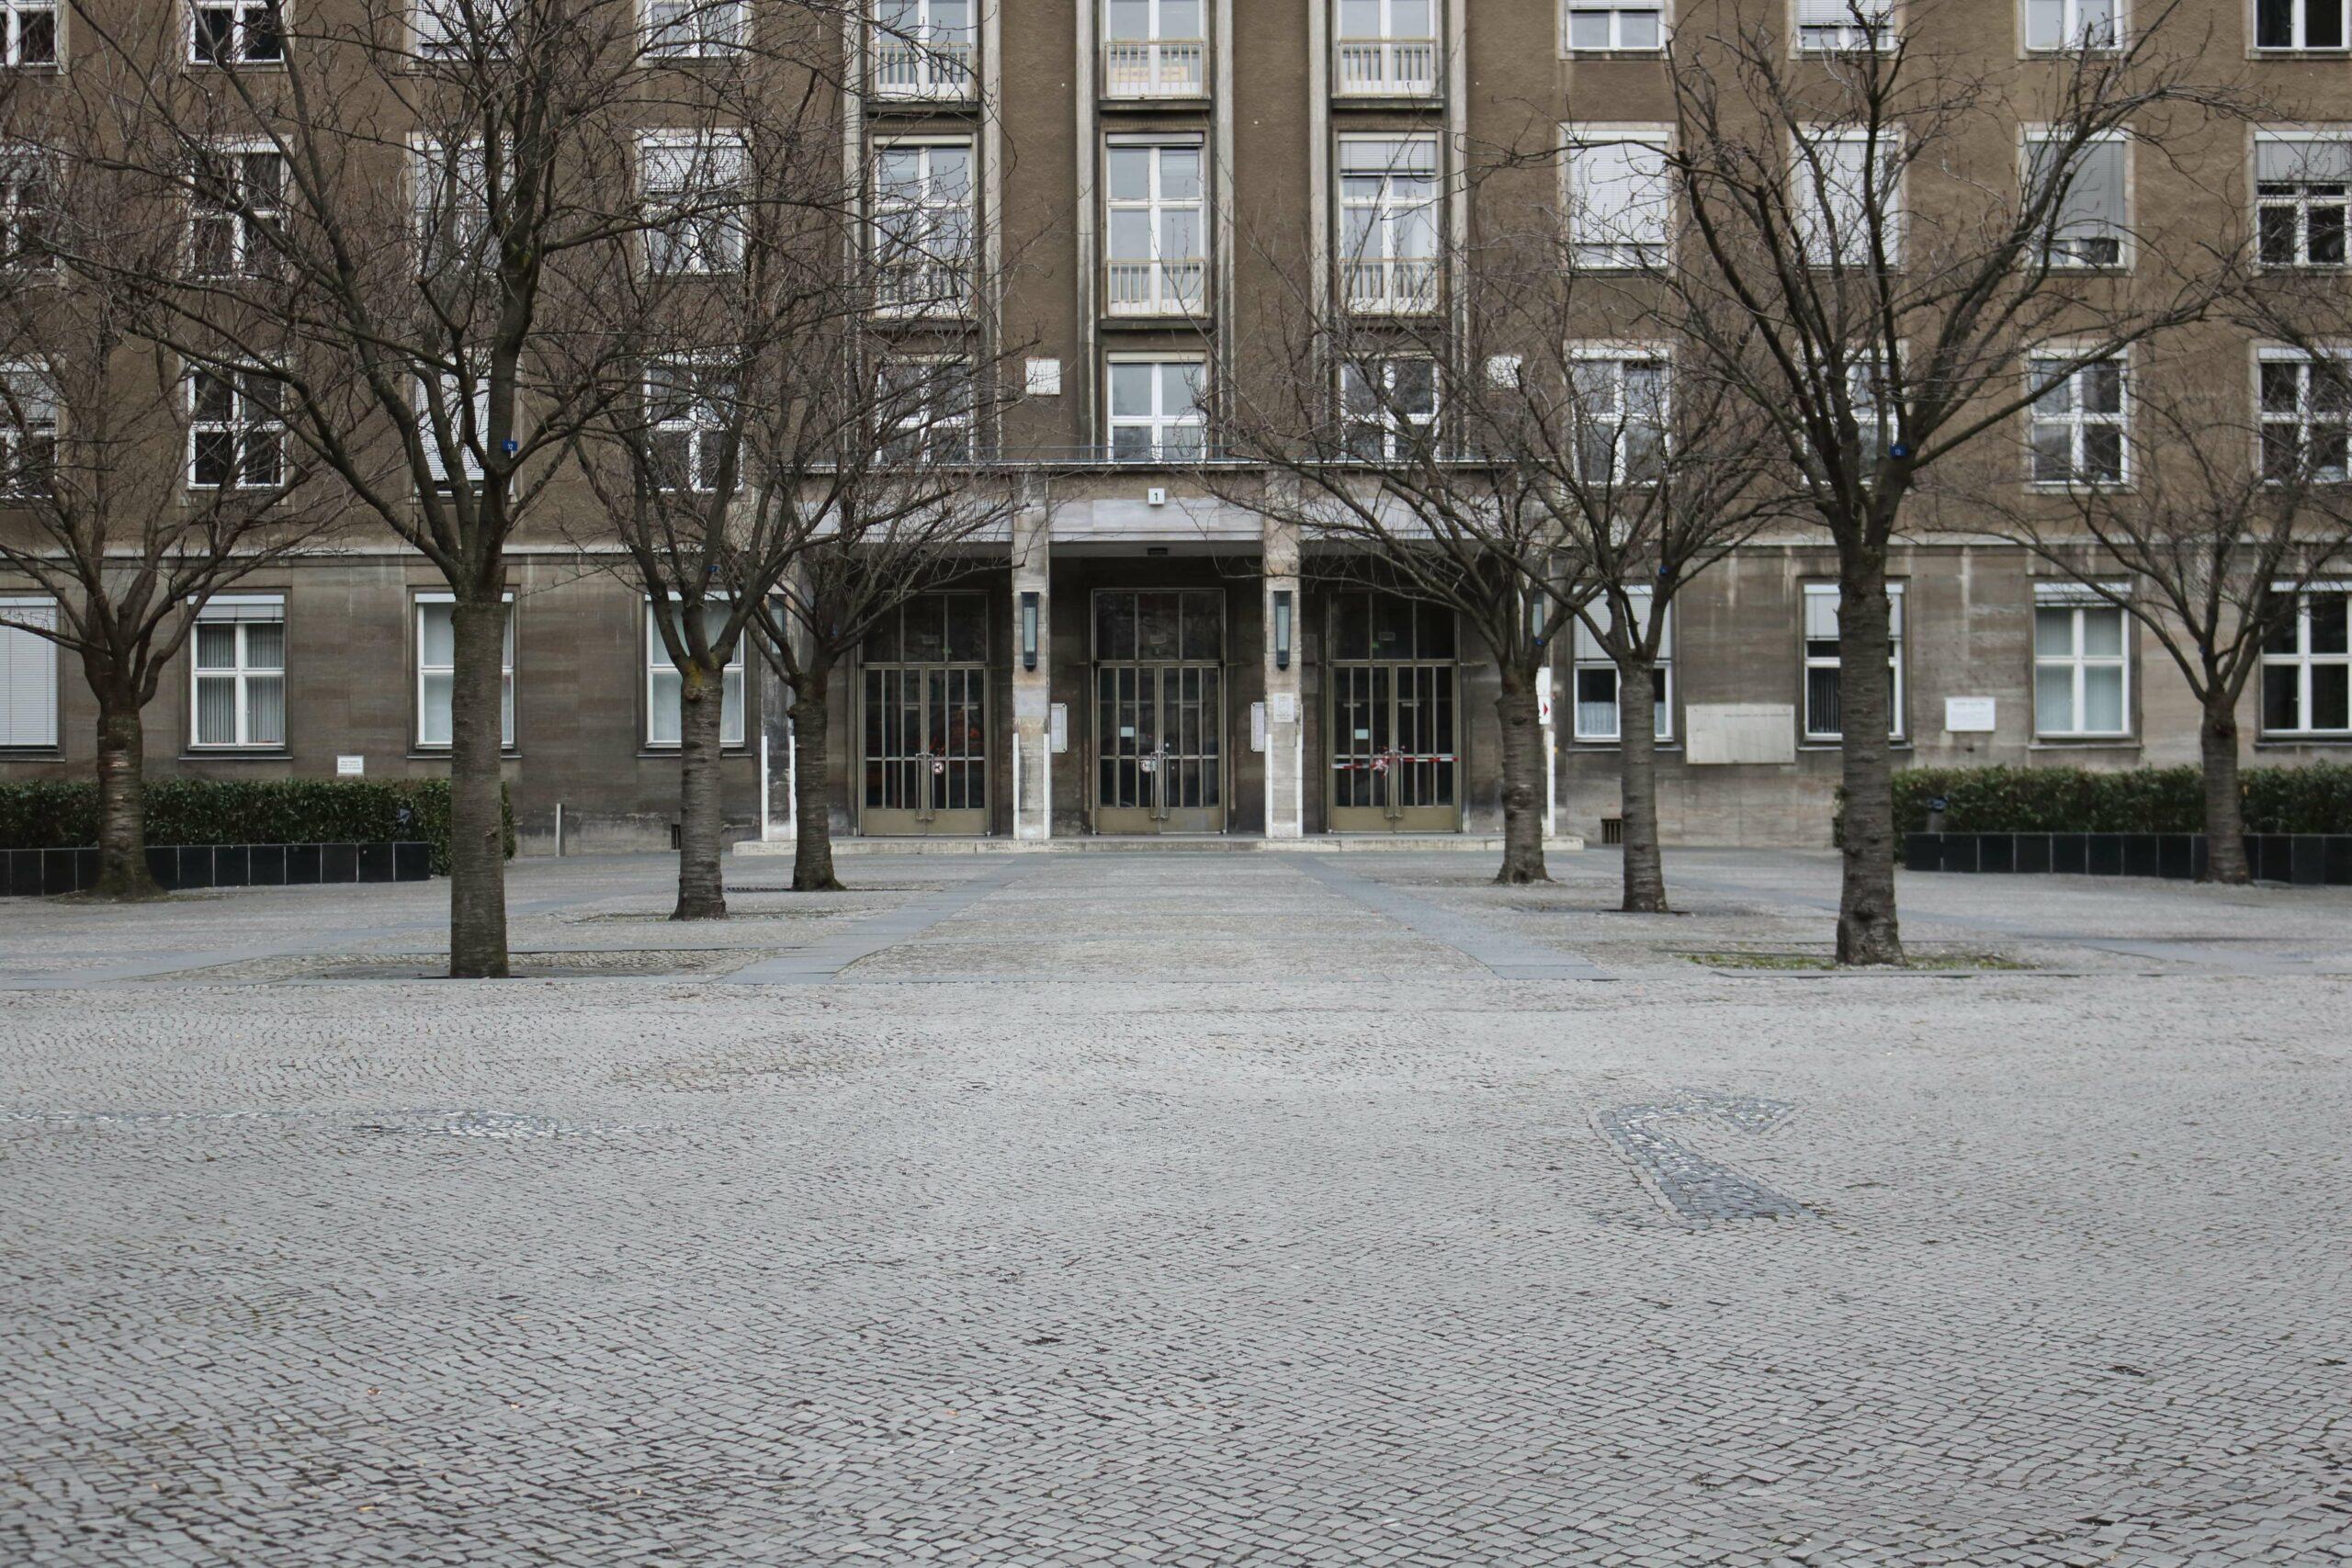 Bürgeramt Rathaus Tiergarten